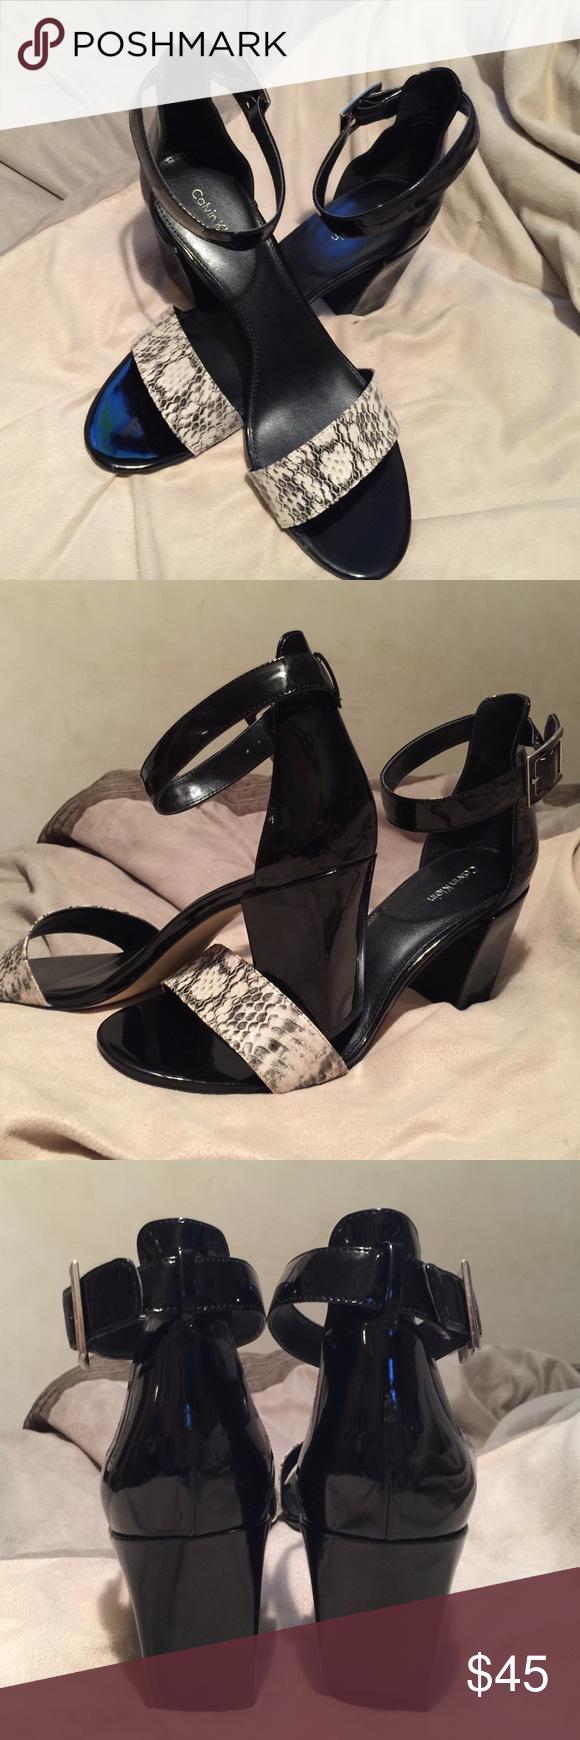 984eab054d8 Calvin Klein Black Patent & Snake Skin Heels Stylish Calvin Klein ...